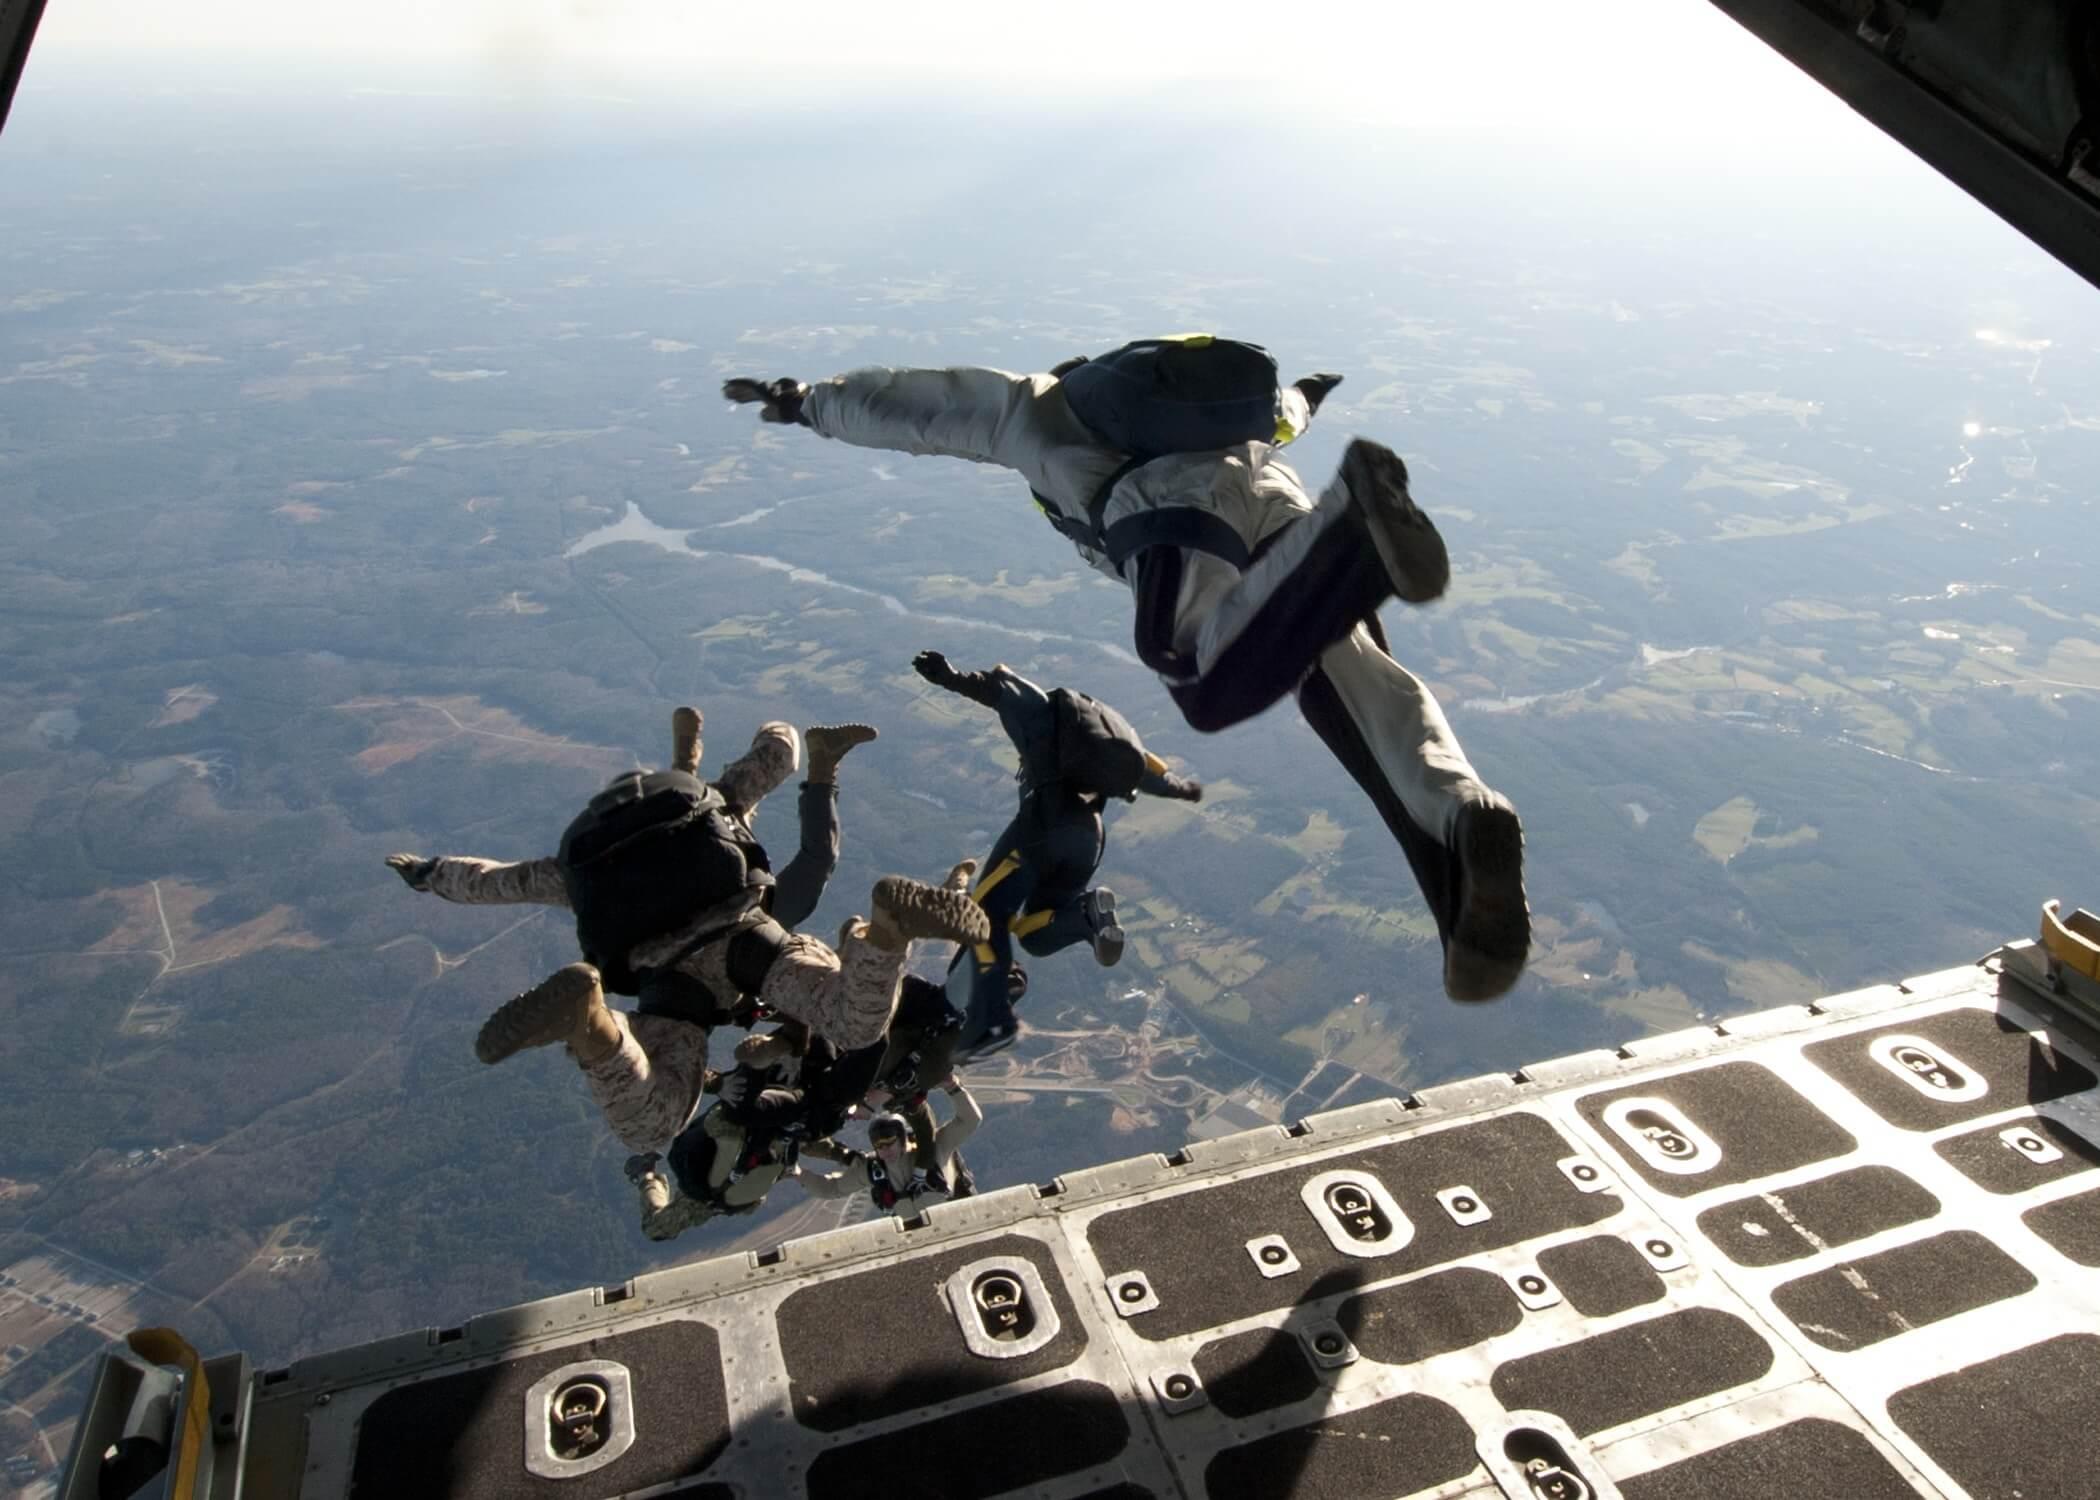 parachute-training-569961